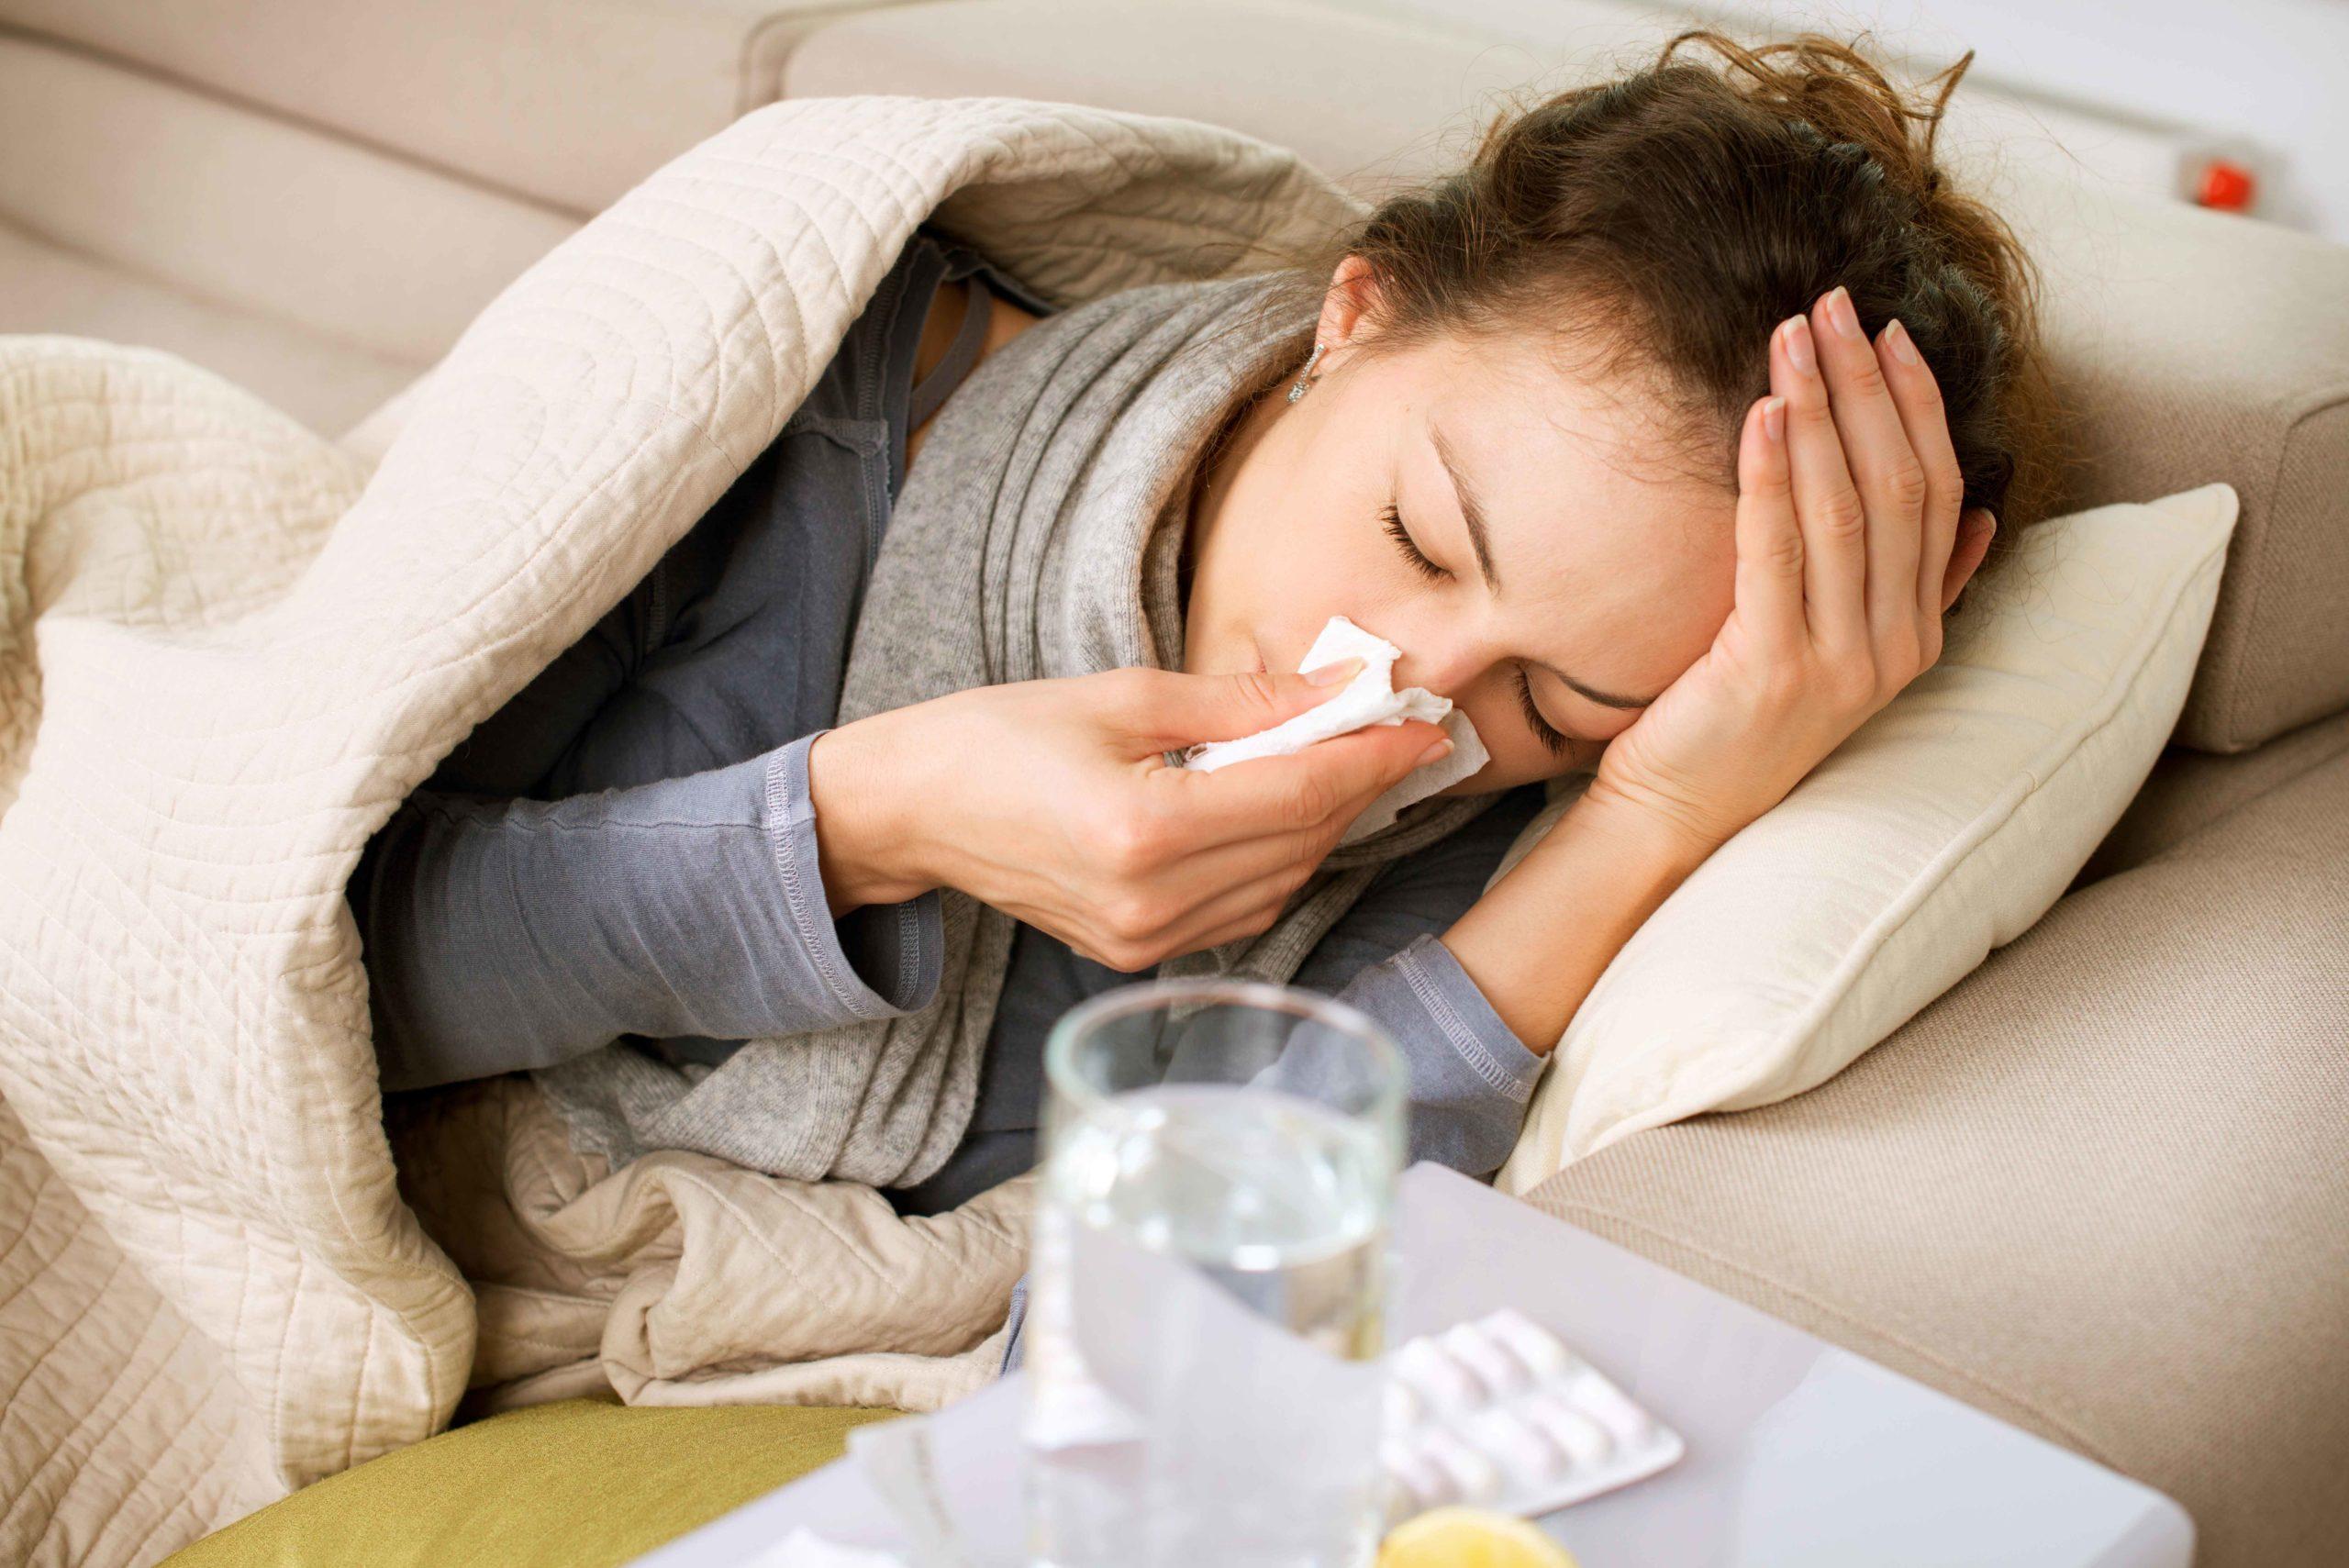 Keto dieet beschermt tegen griepvirus